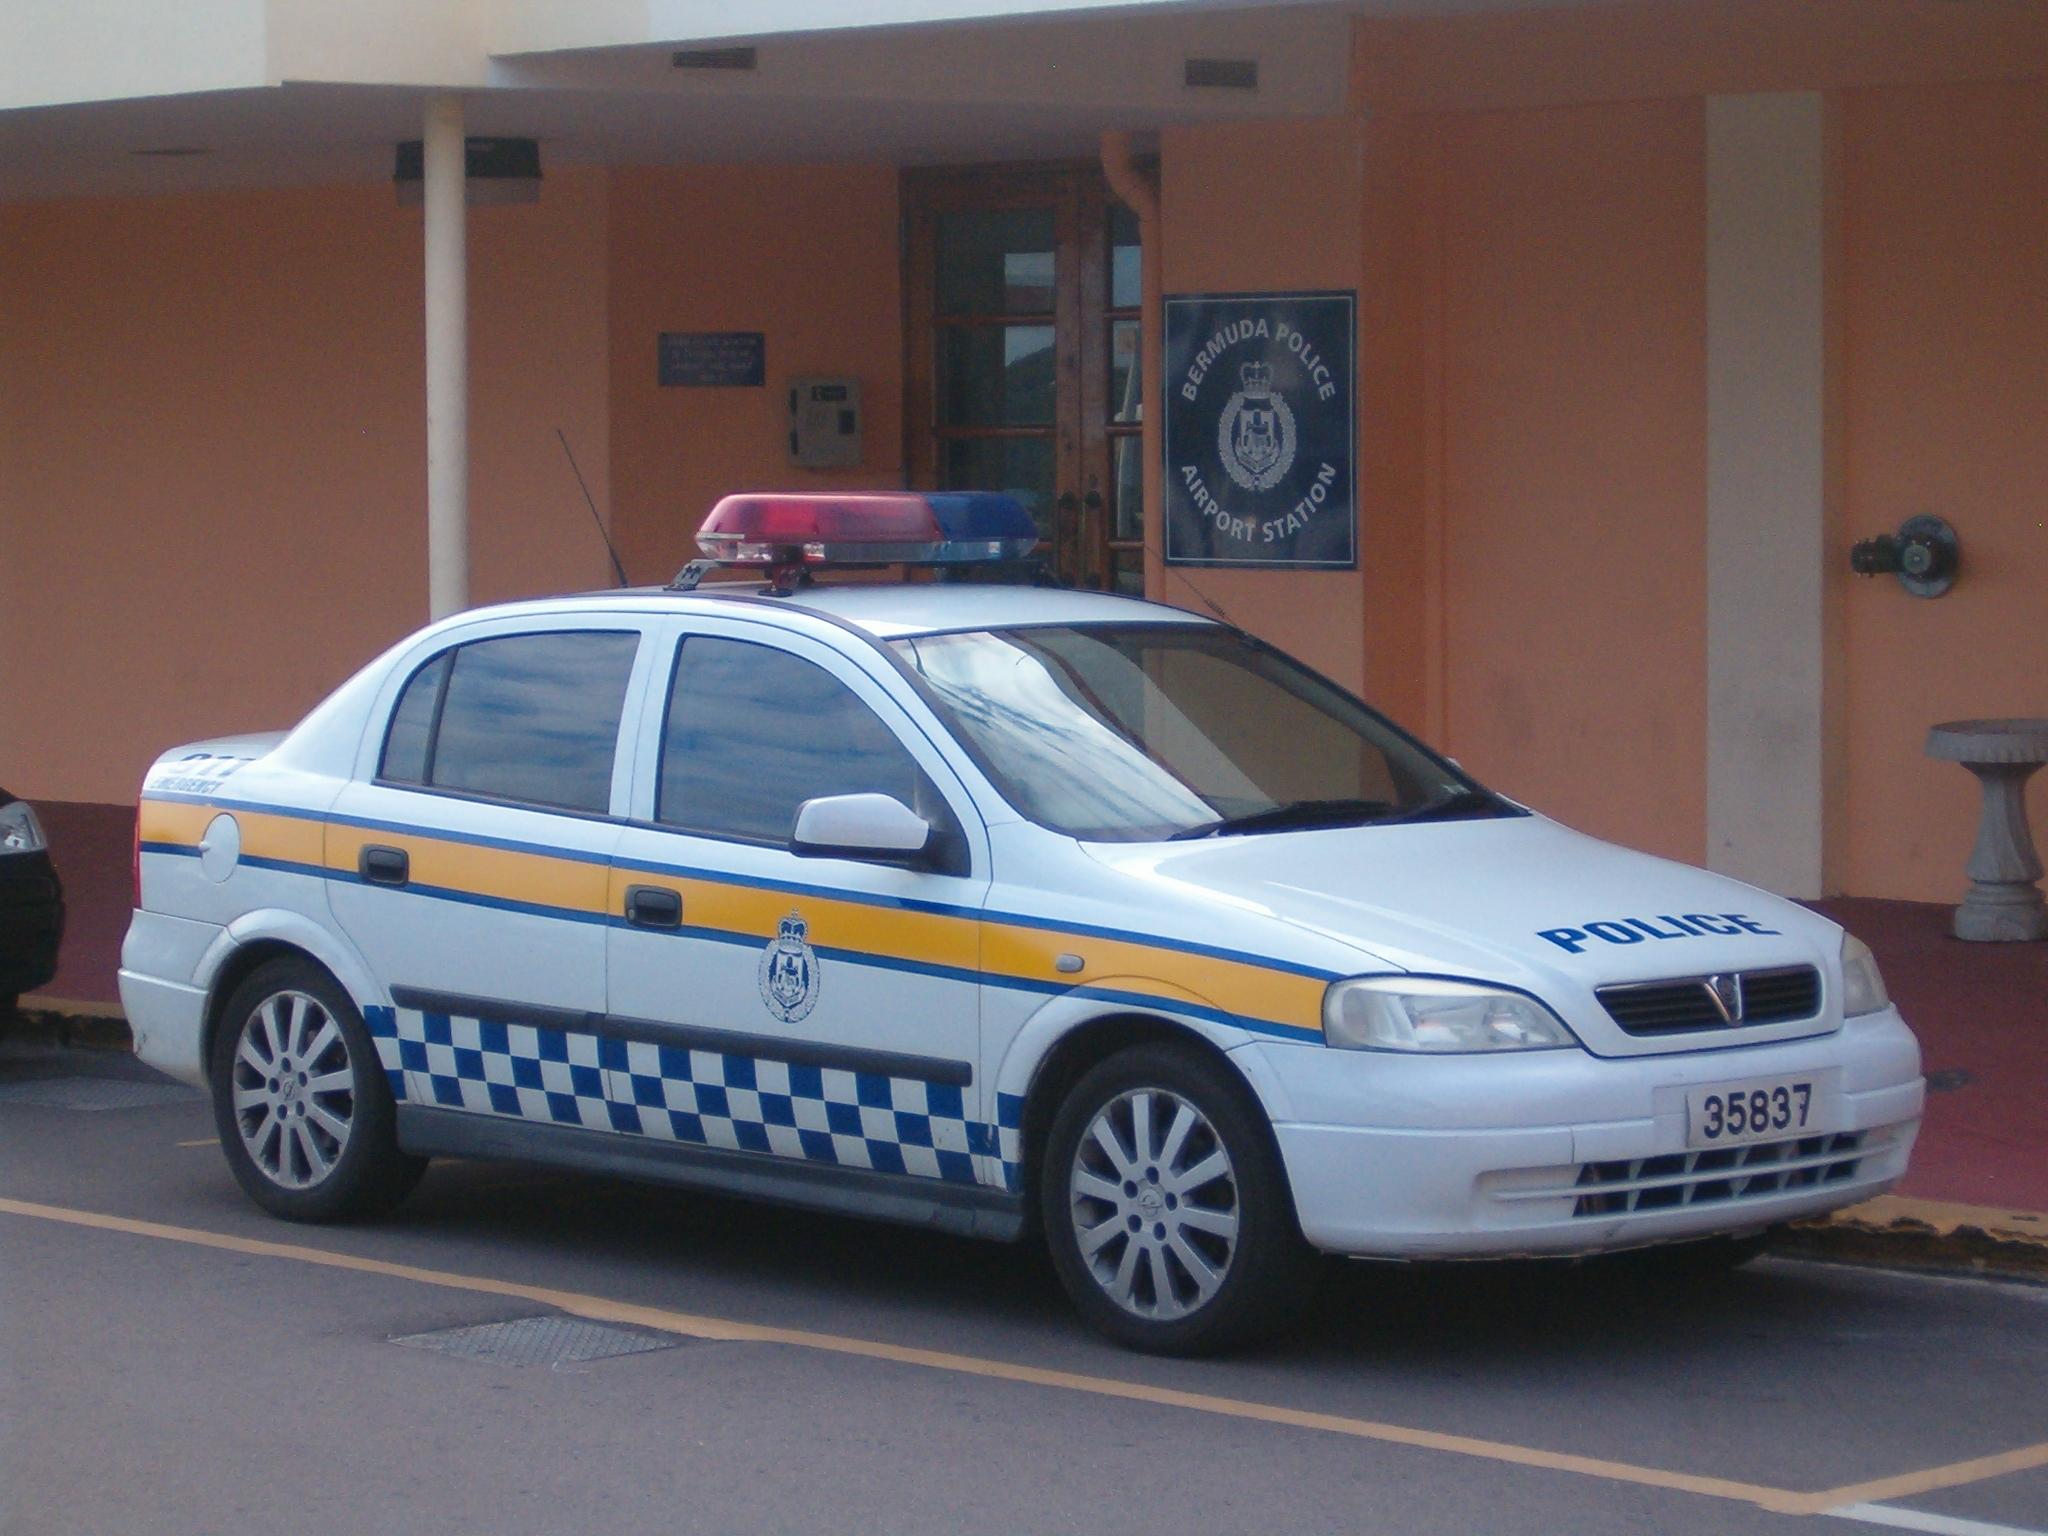 Bermuda Car Service Airport